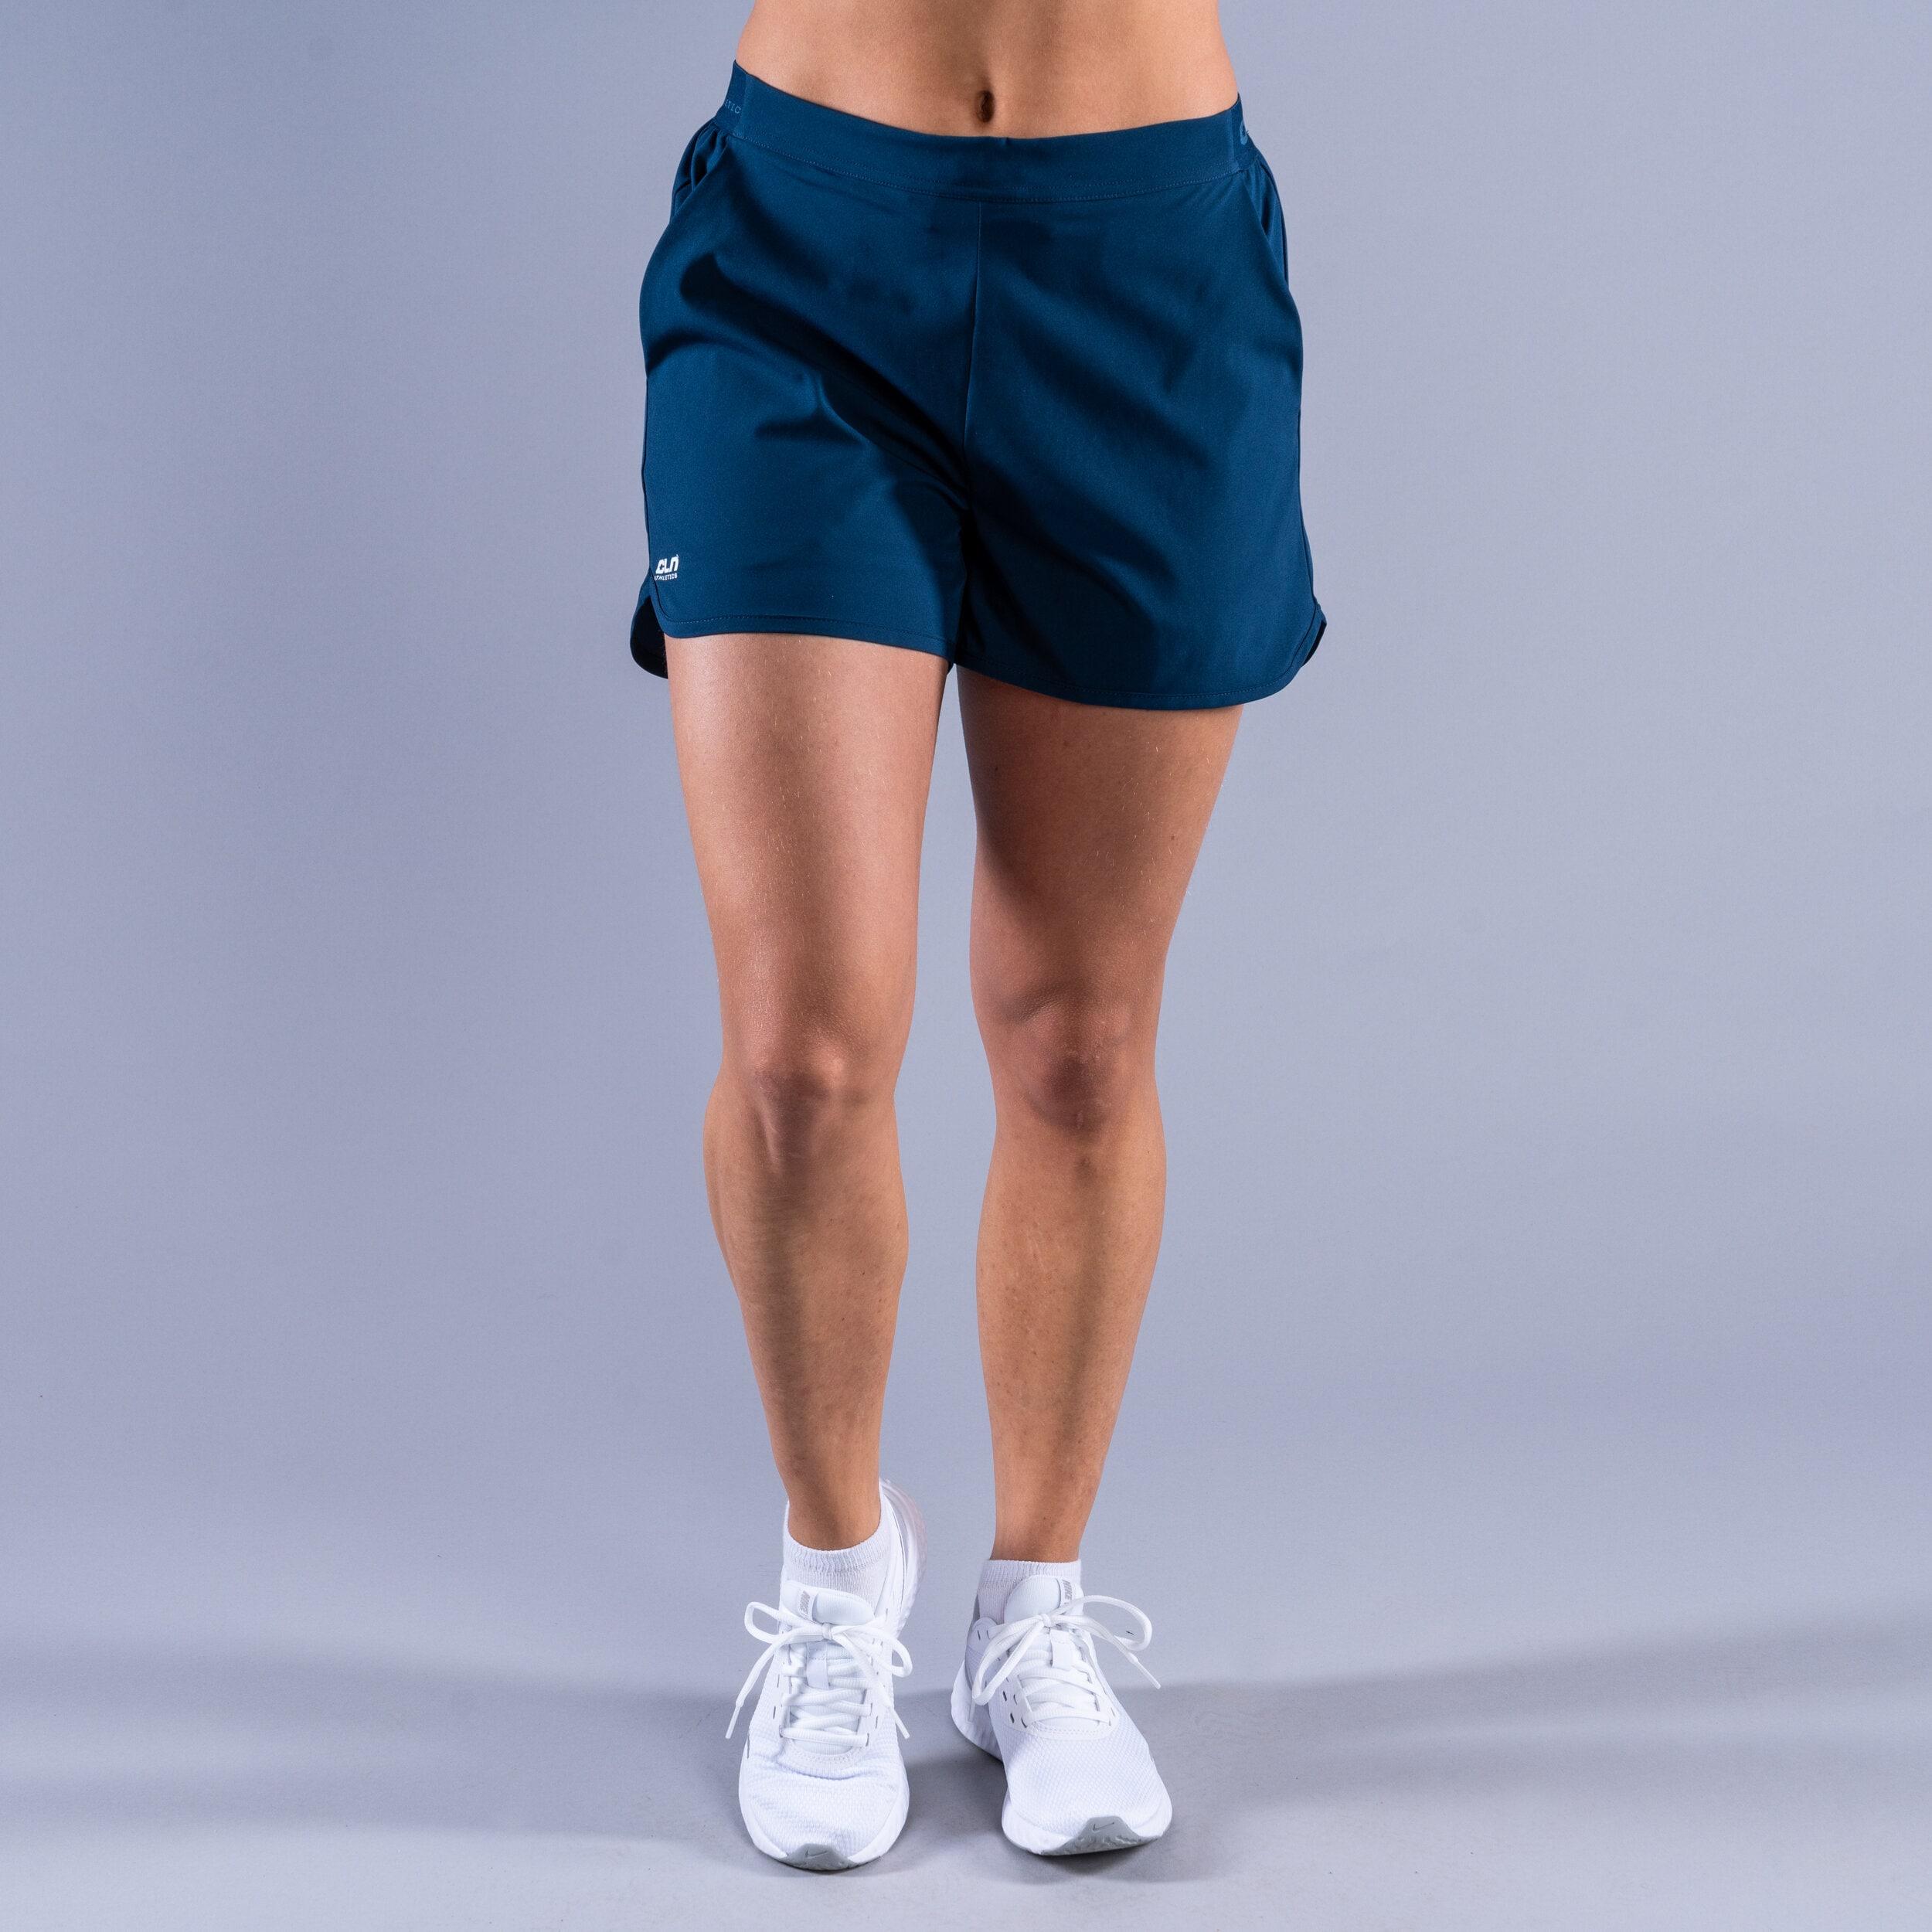 CLN Action ws stretch shorts Titan blue